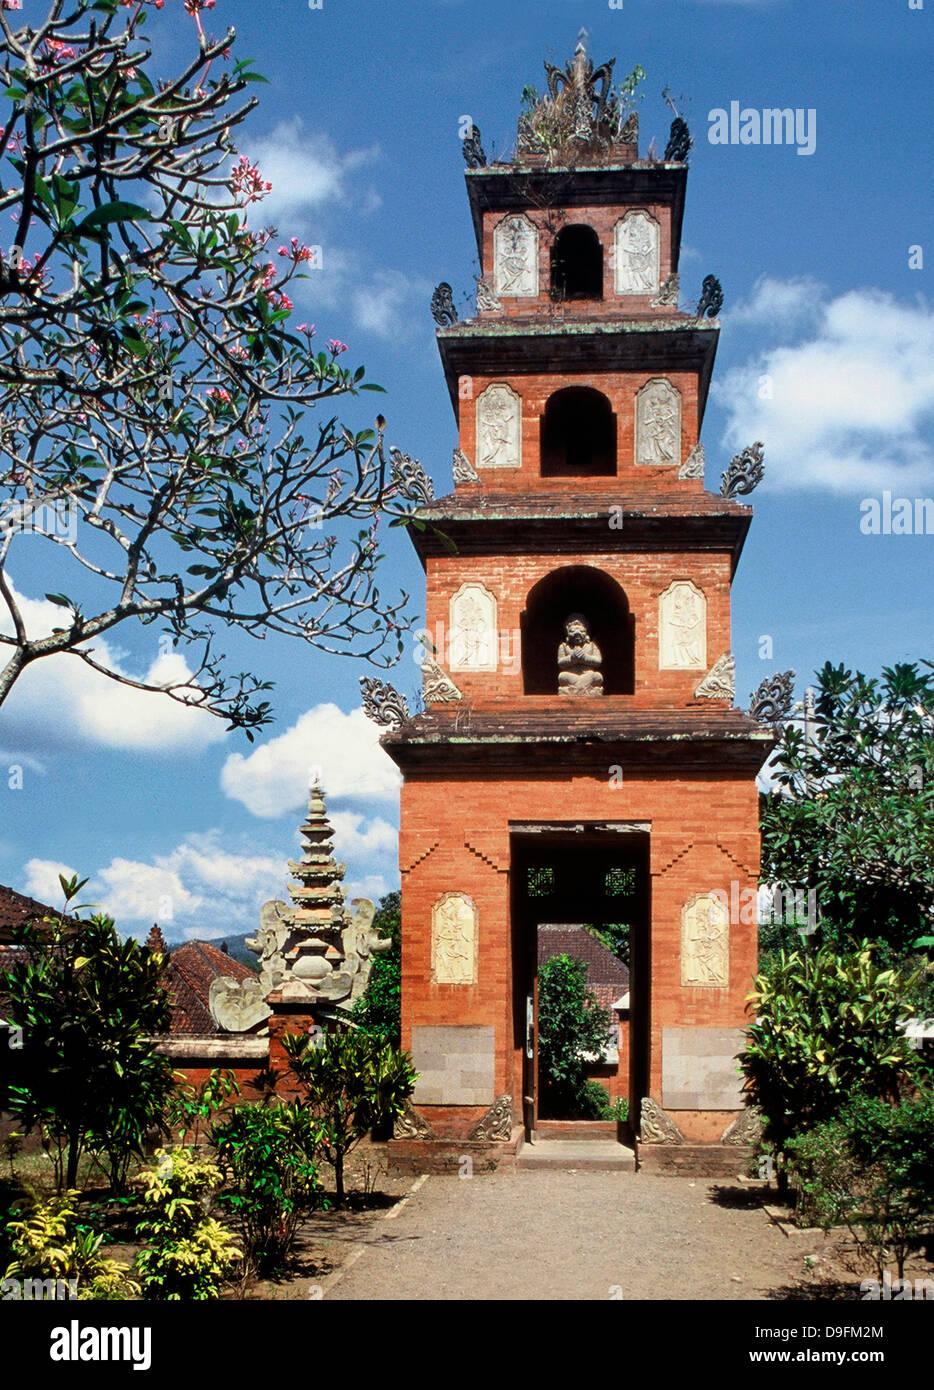 Im chinesischen Stil Tor, Karangasem Palace in Amlapura, Bali, Indonesien, Südostasien Stockbild